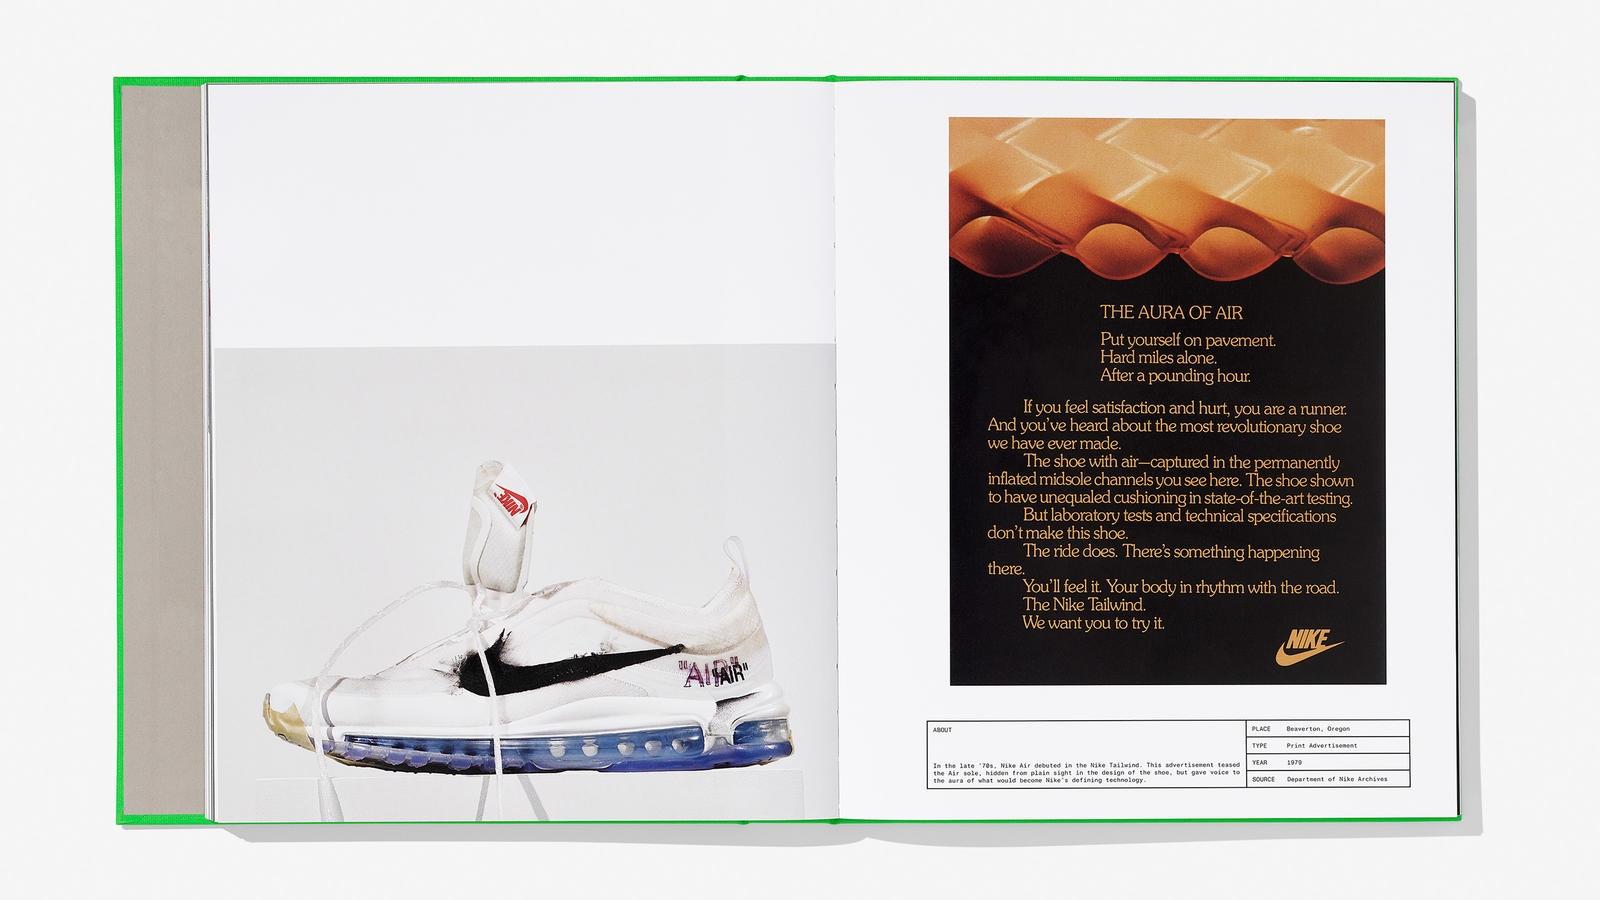 ICON Nike Virgil Abloh